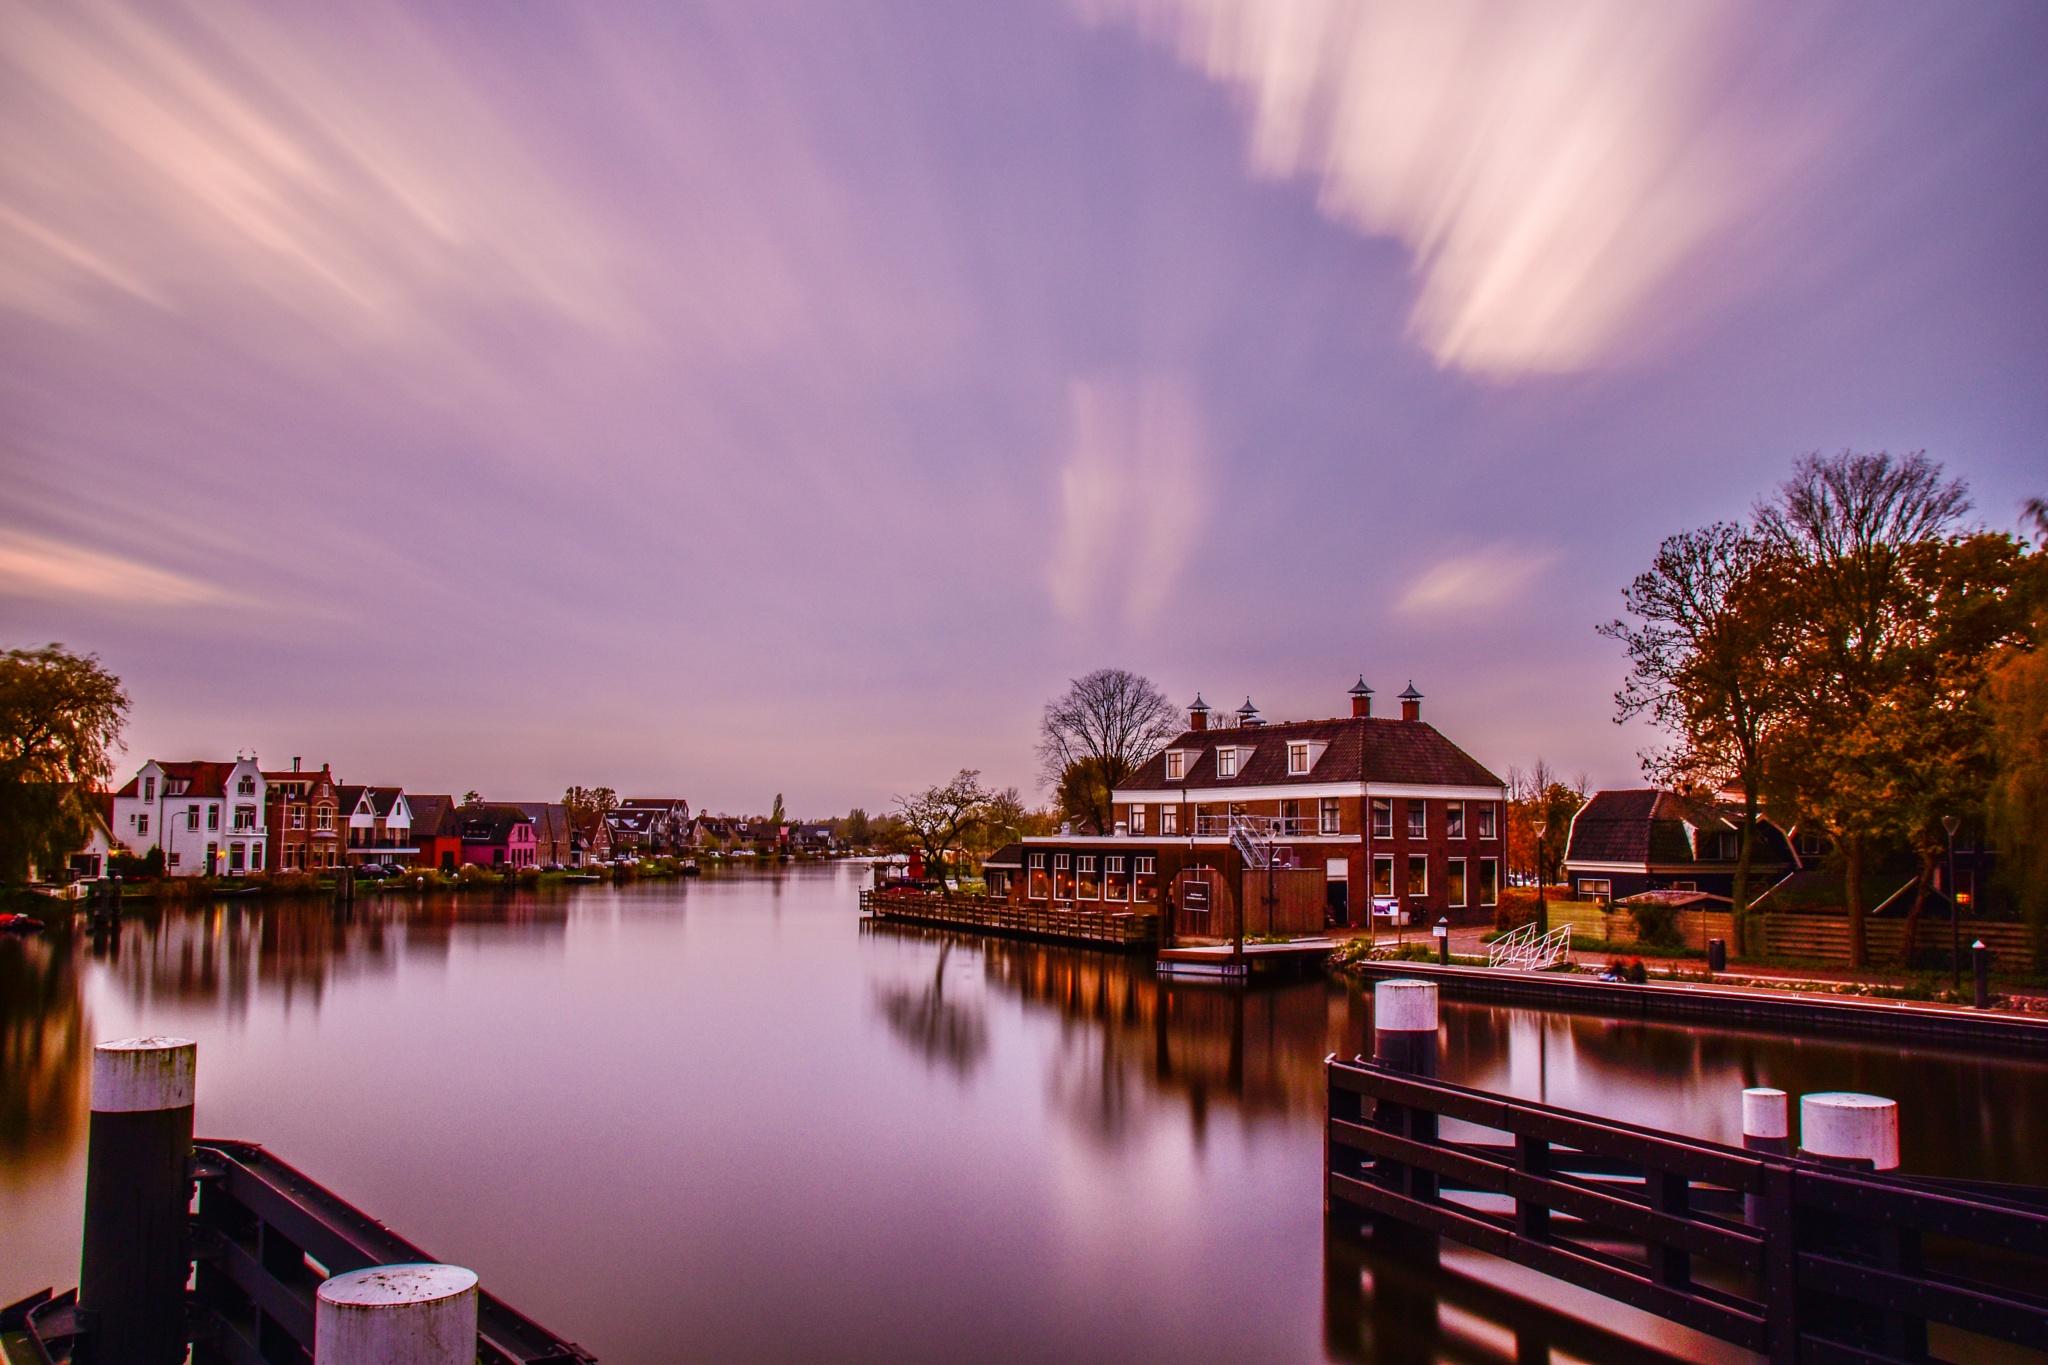 Beautiful Uithoorn by San Zijlstra